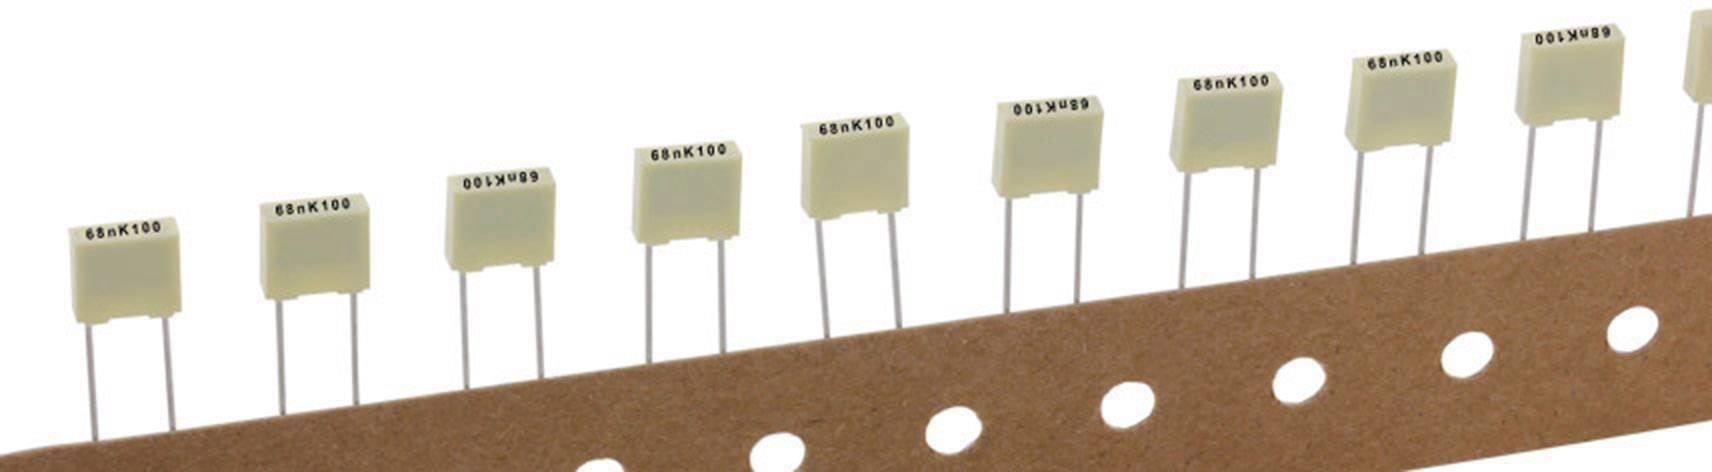 Polyesterový kondenzátor Kemet R82EC1470DQ50K+ radiální, 4.7 nF, 100 V,10 %, 5 mm, (d x š x v) 7.2 x 2.5 mm x 6.5 mm, 1 ks